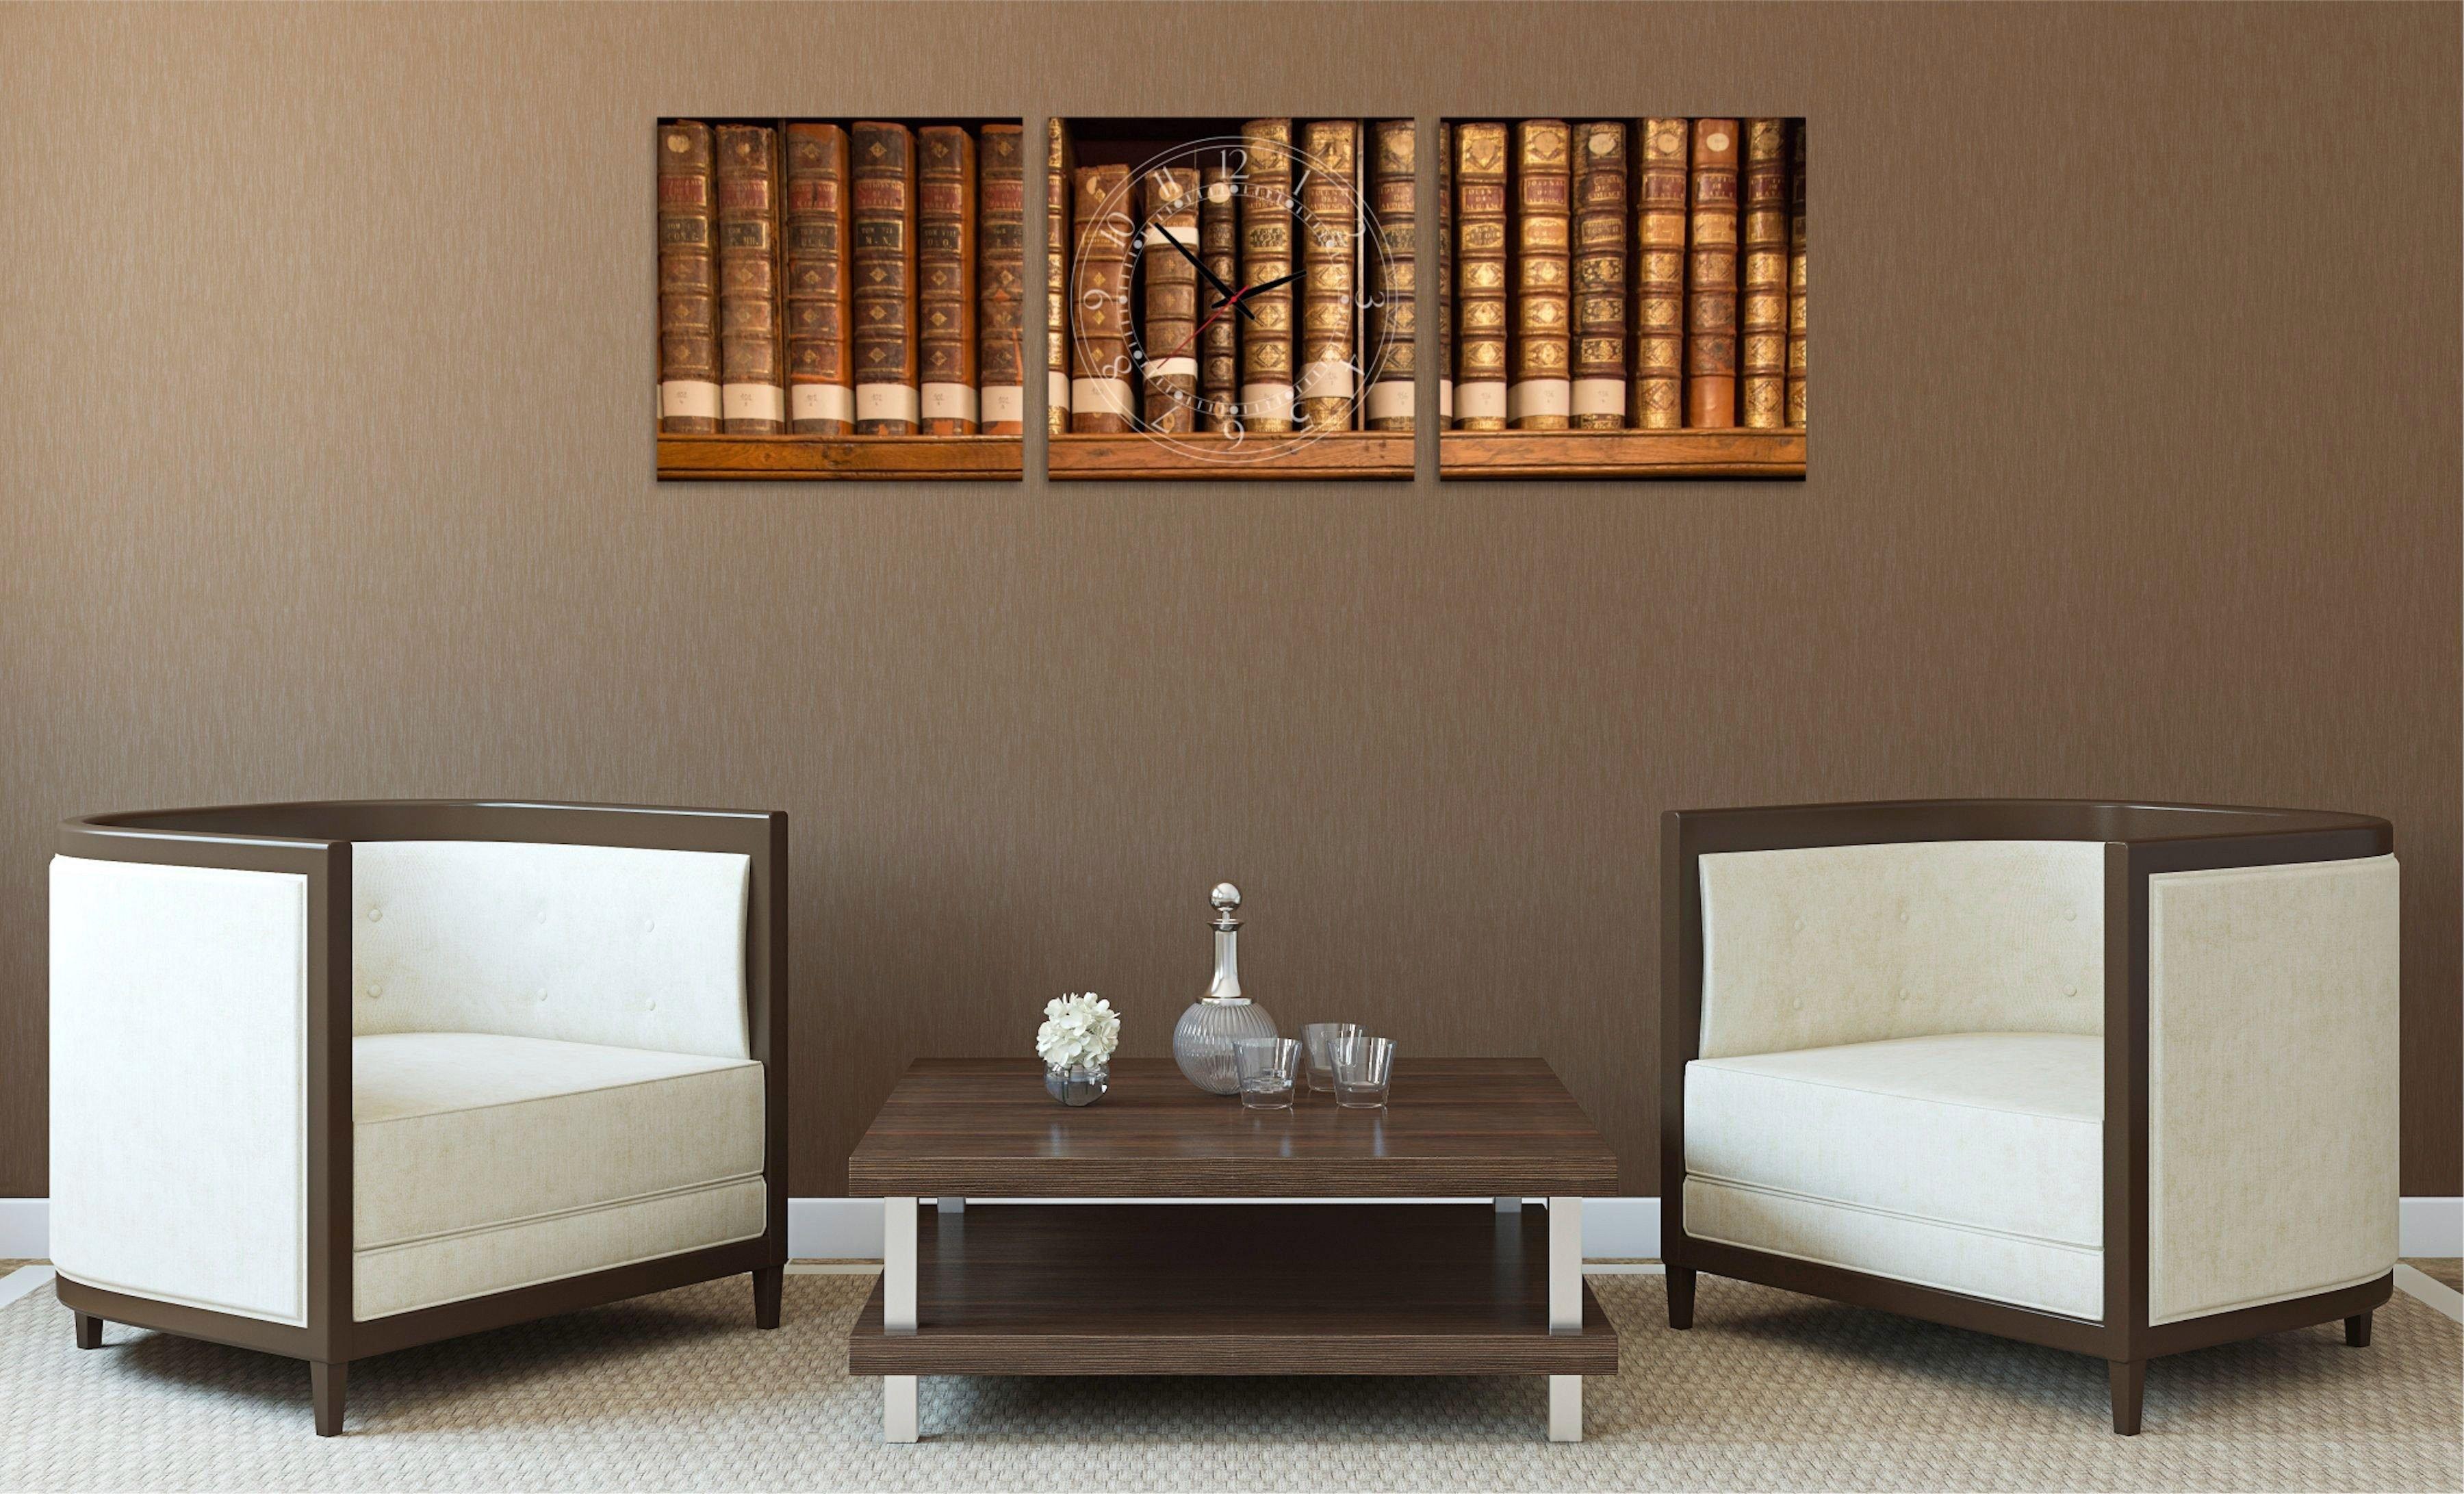 Conni Oberkircher´s wanddecoratie »Books« veilig op otto.nl kopen